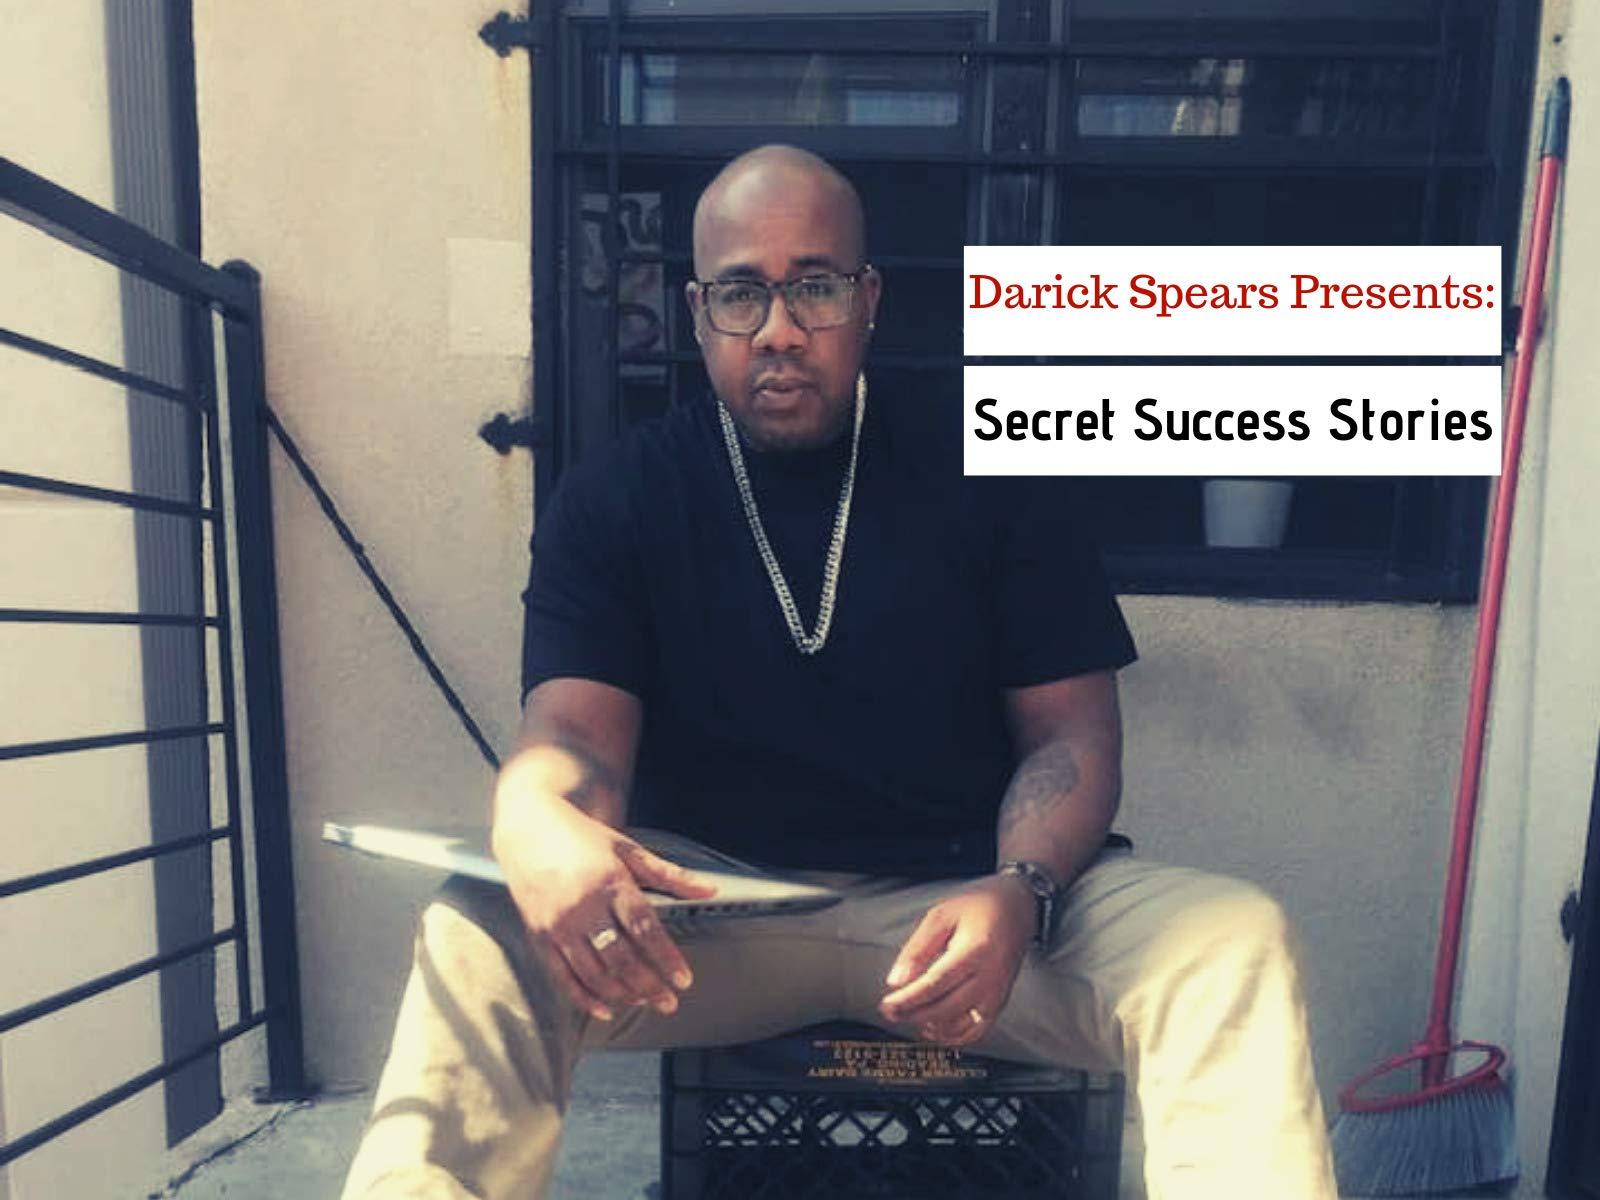 Darick Spears Presents: Secret Success Stories